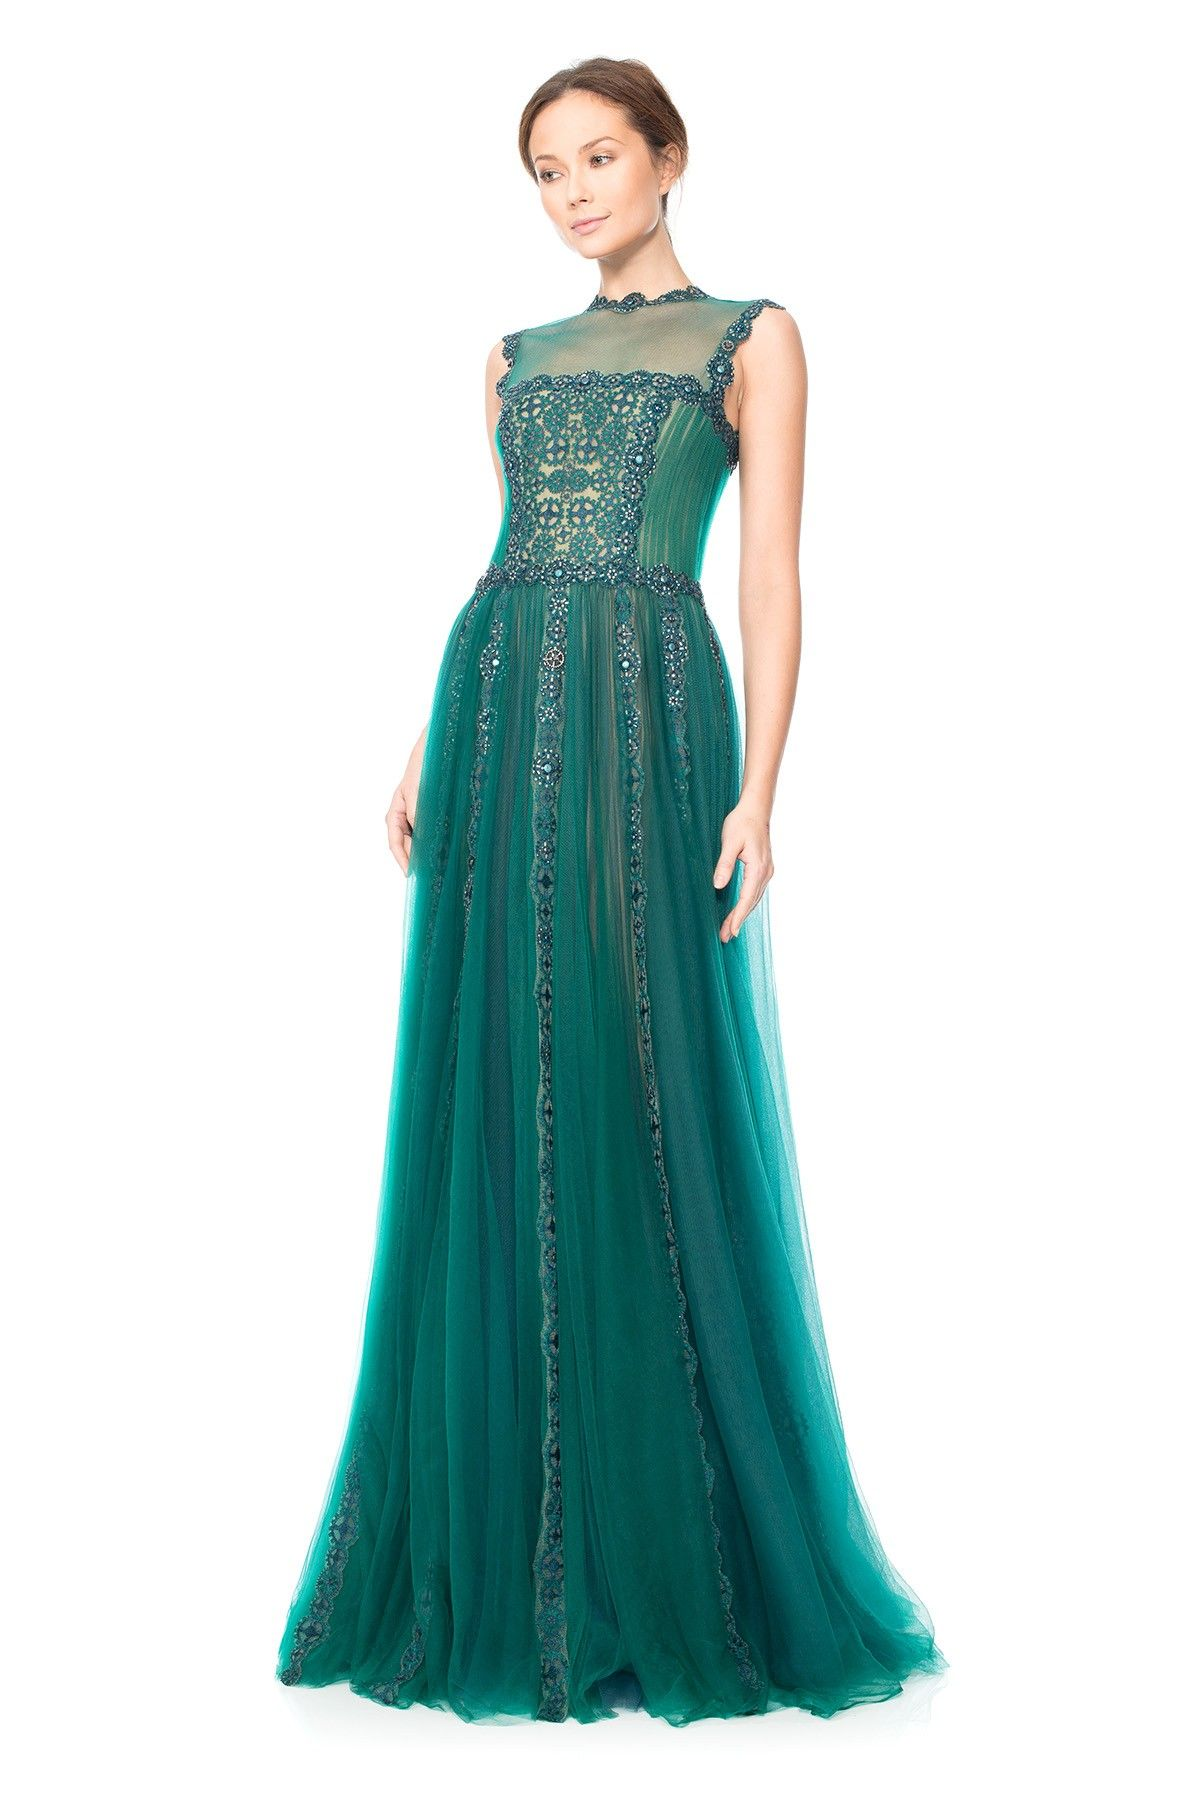 Mynah Gown   Tadashi Shoji   wedding dresses   Pinterest   Tadashi ...